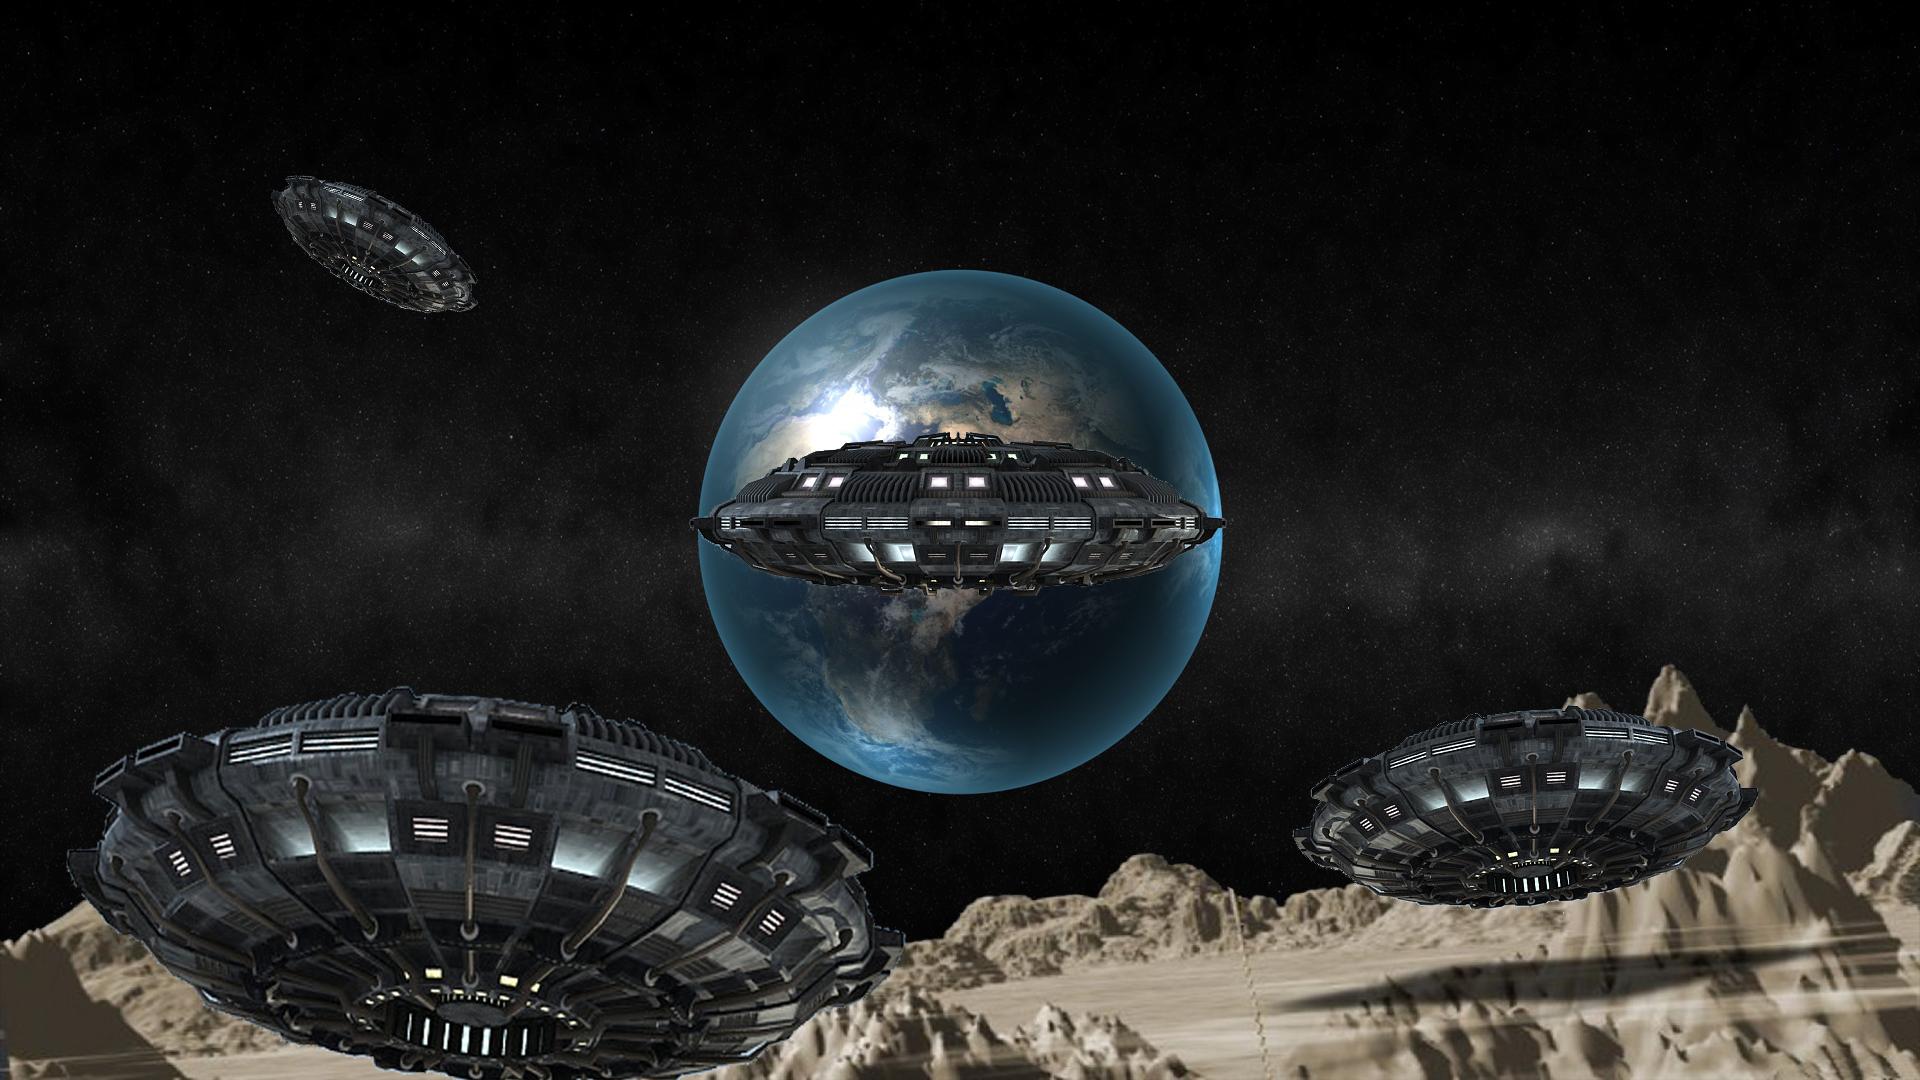 HD UFO Wallpaper Space Earth Nasa Hd Wallpapers 5 UFONEDERLAND 1920x1080